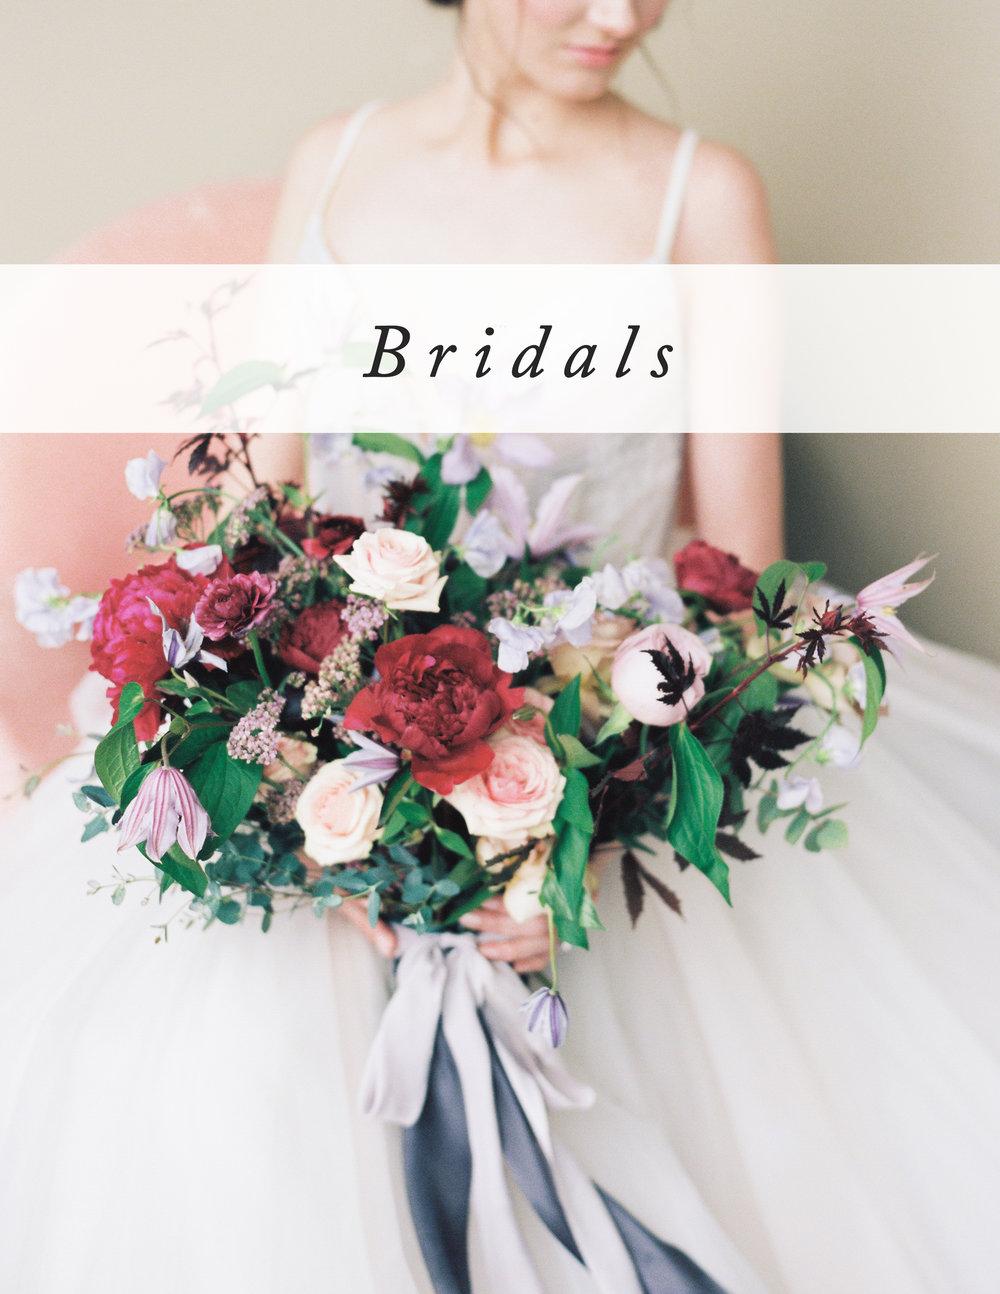 bridals.jpg